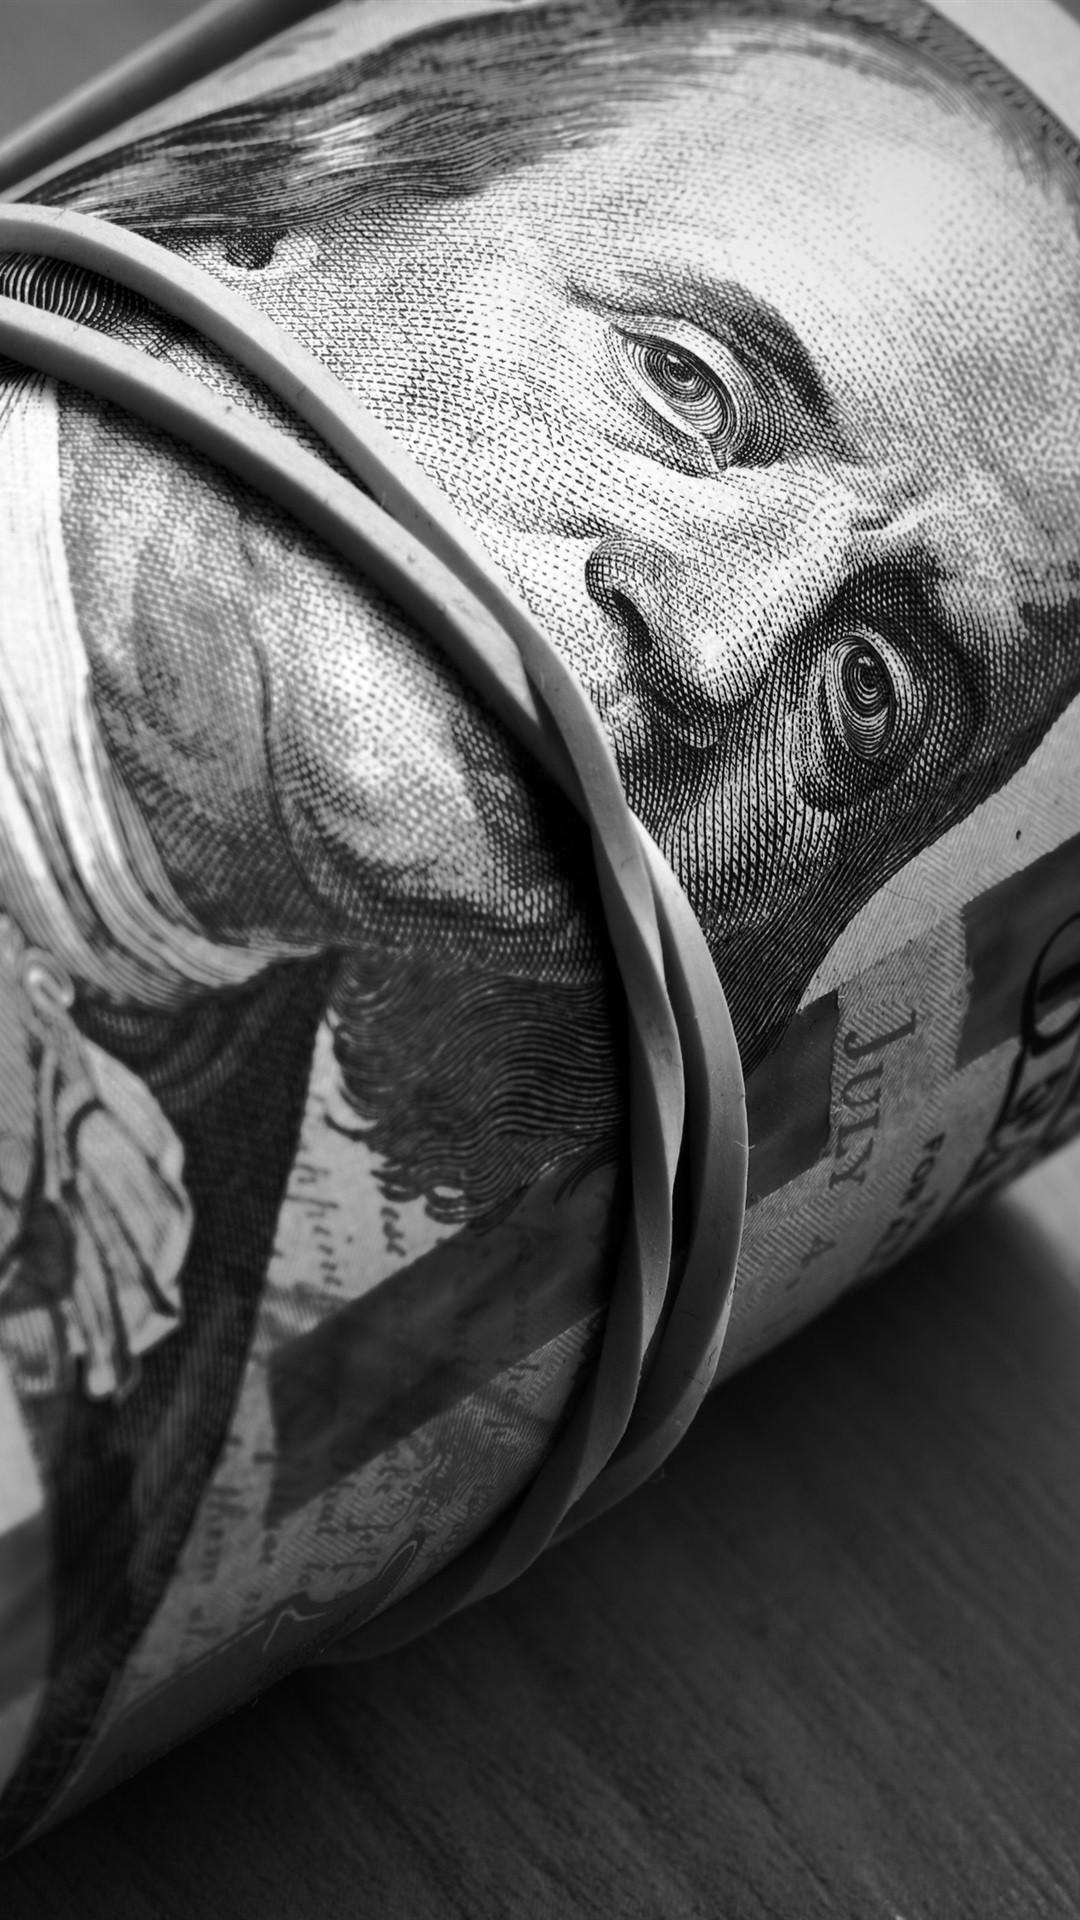 Money iphone home screen wallpaper